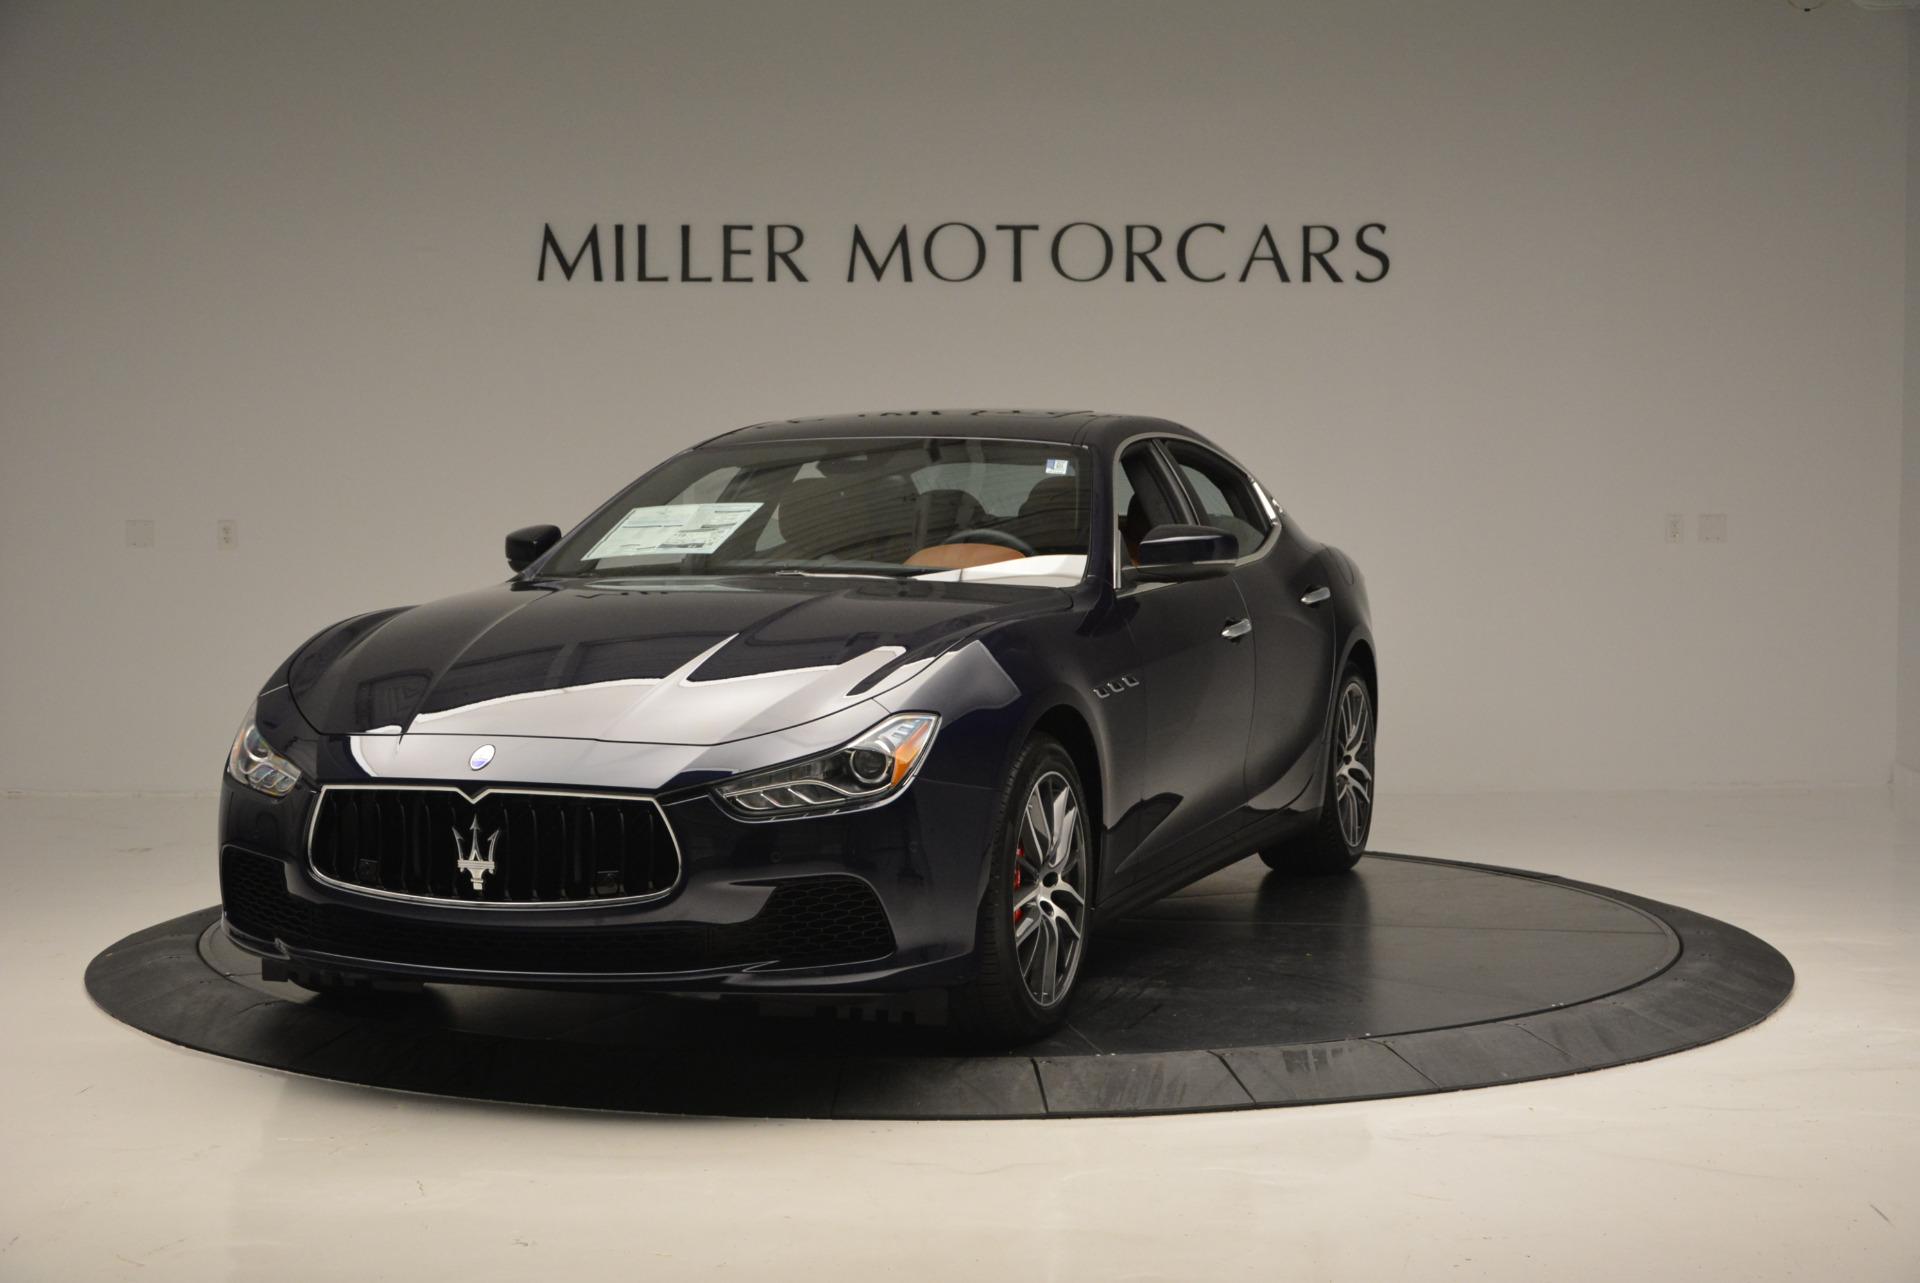 New 2017 Maserati Ghibli S Q4 For Sale In Greenwich, CT 564_main